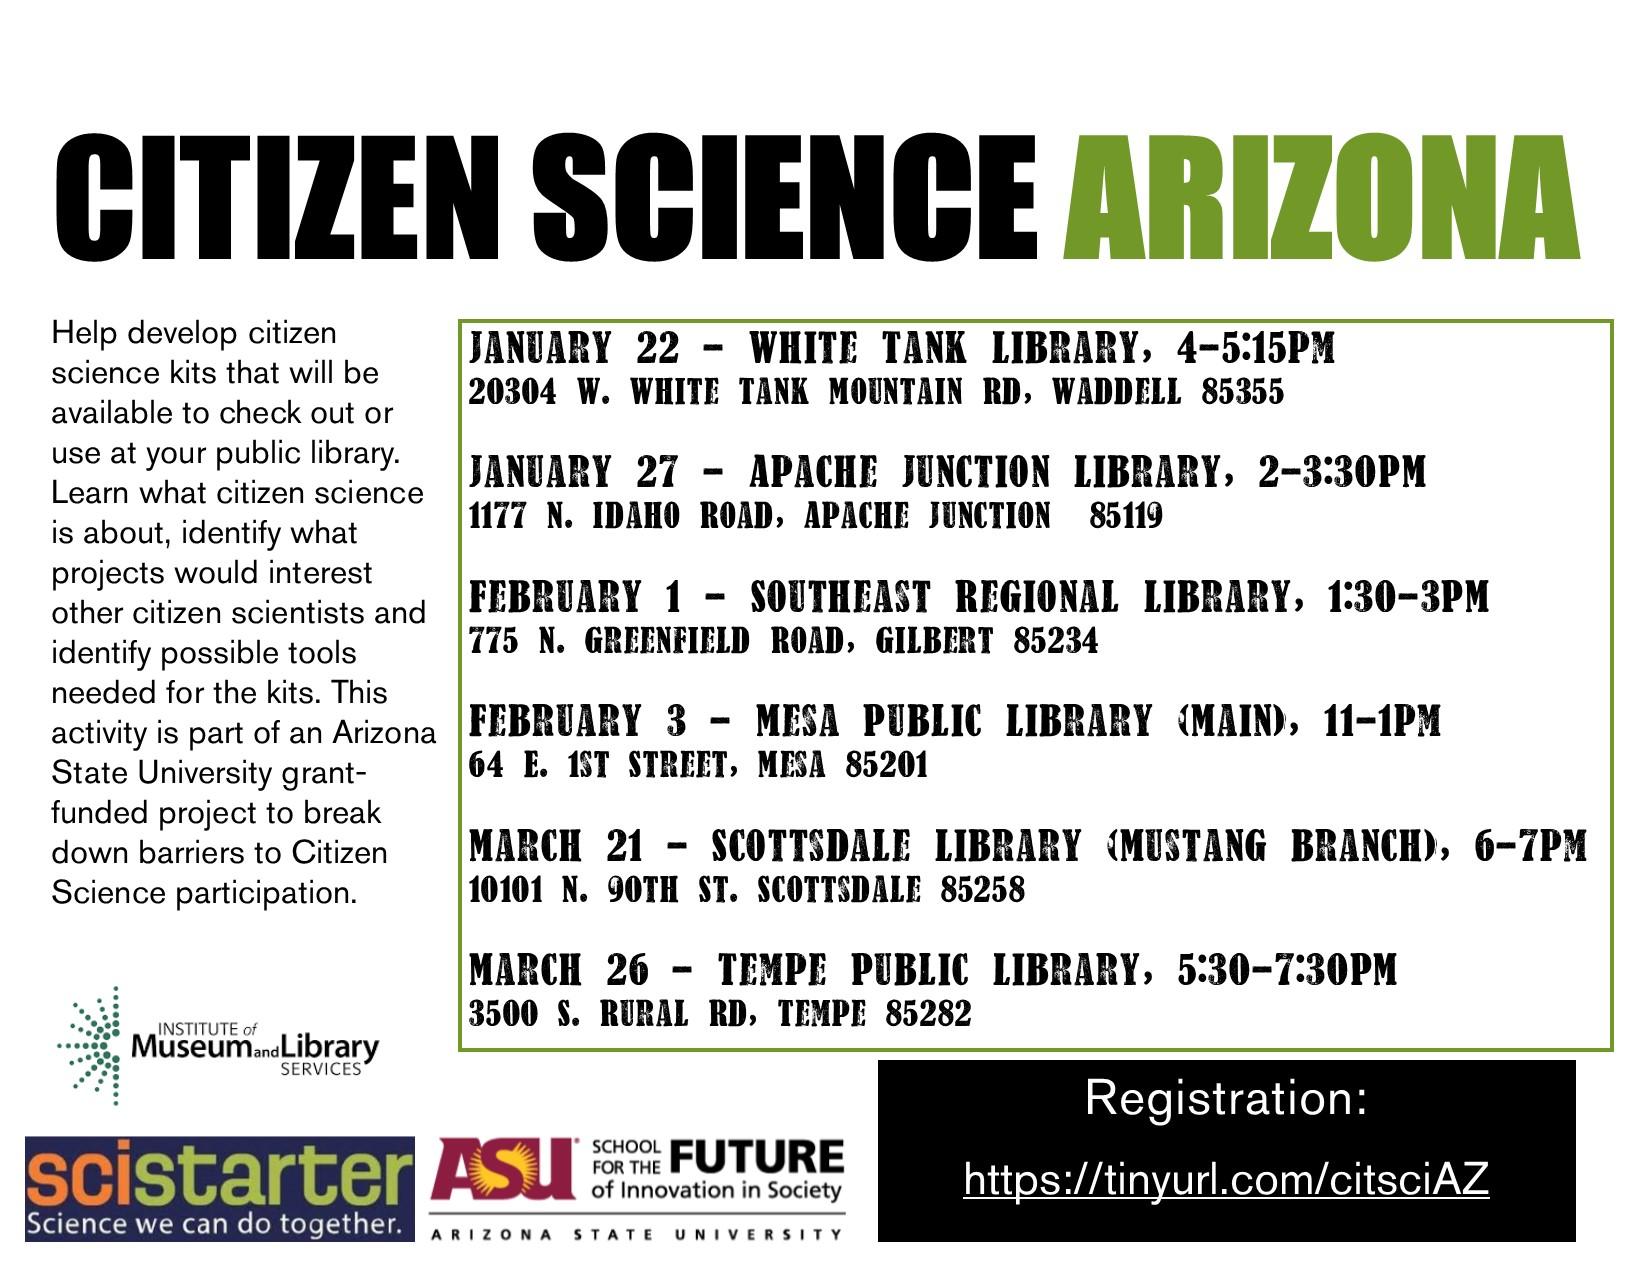 Citizen Science White Tank Library, AZ